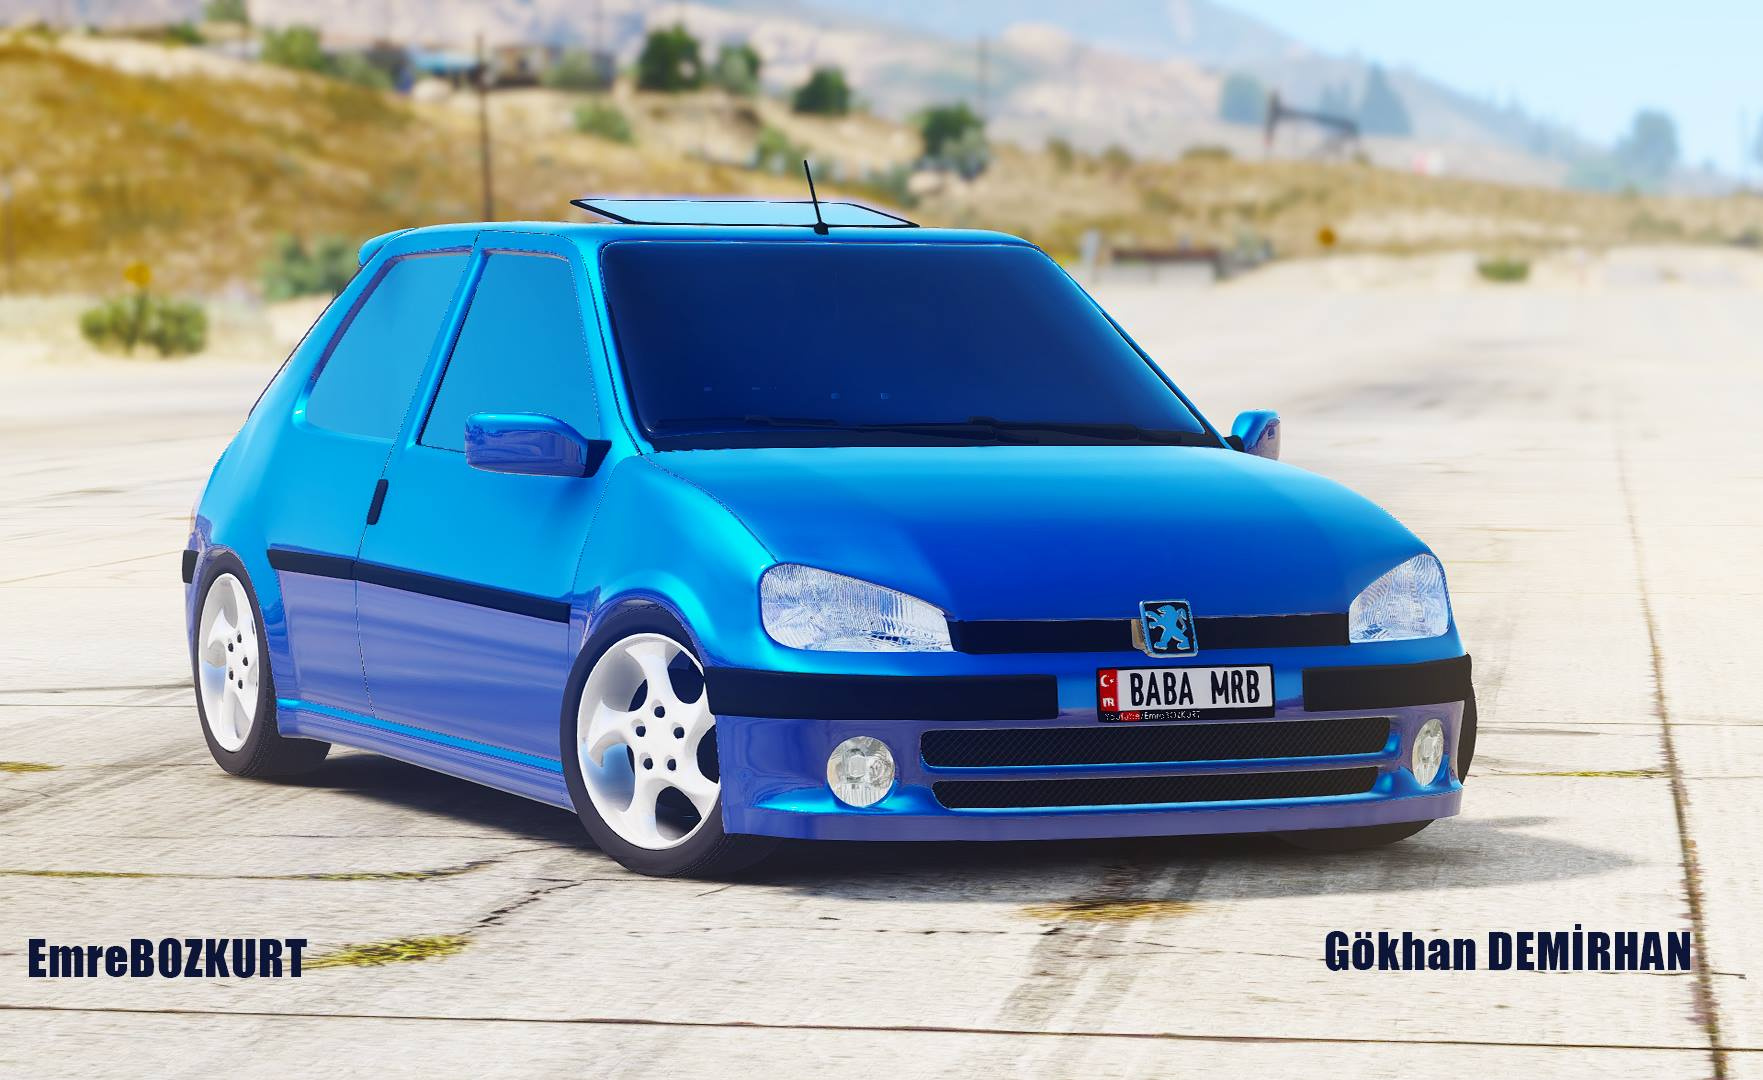 Peugeot 106 [Add-On / Replace] - GTA5-Mods.com on